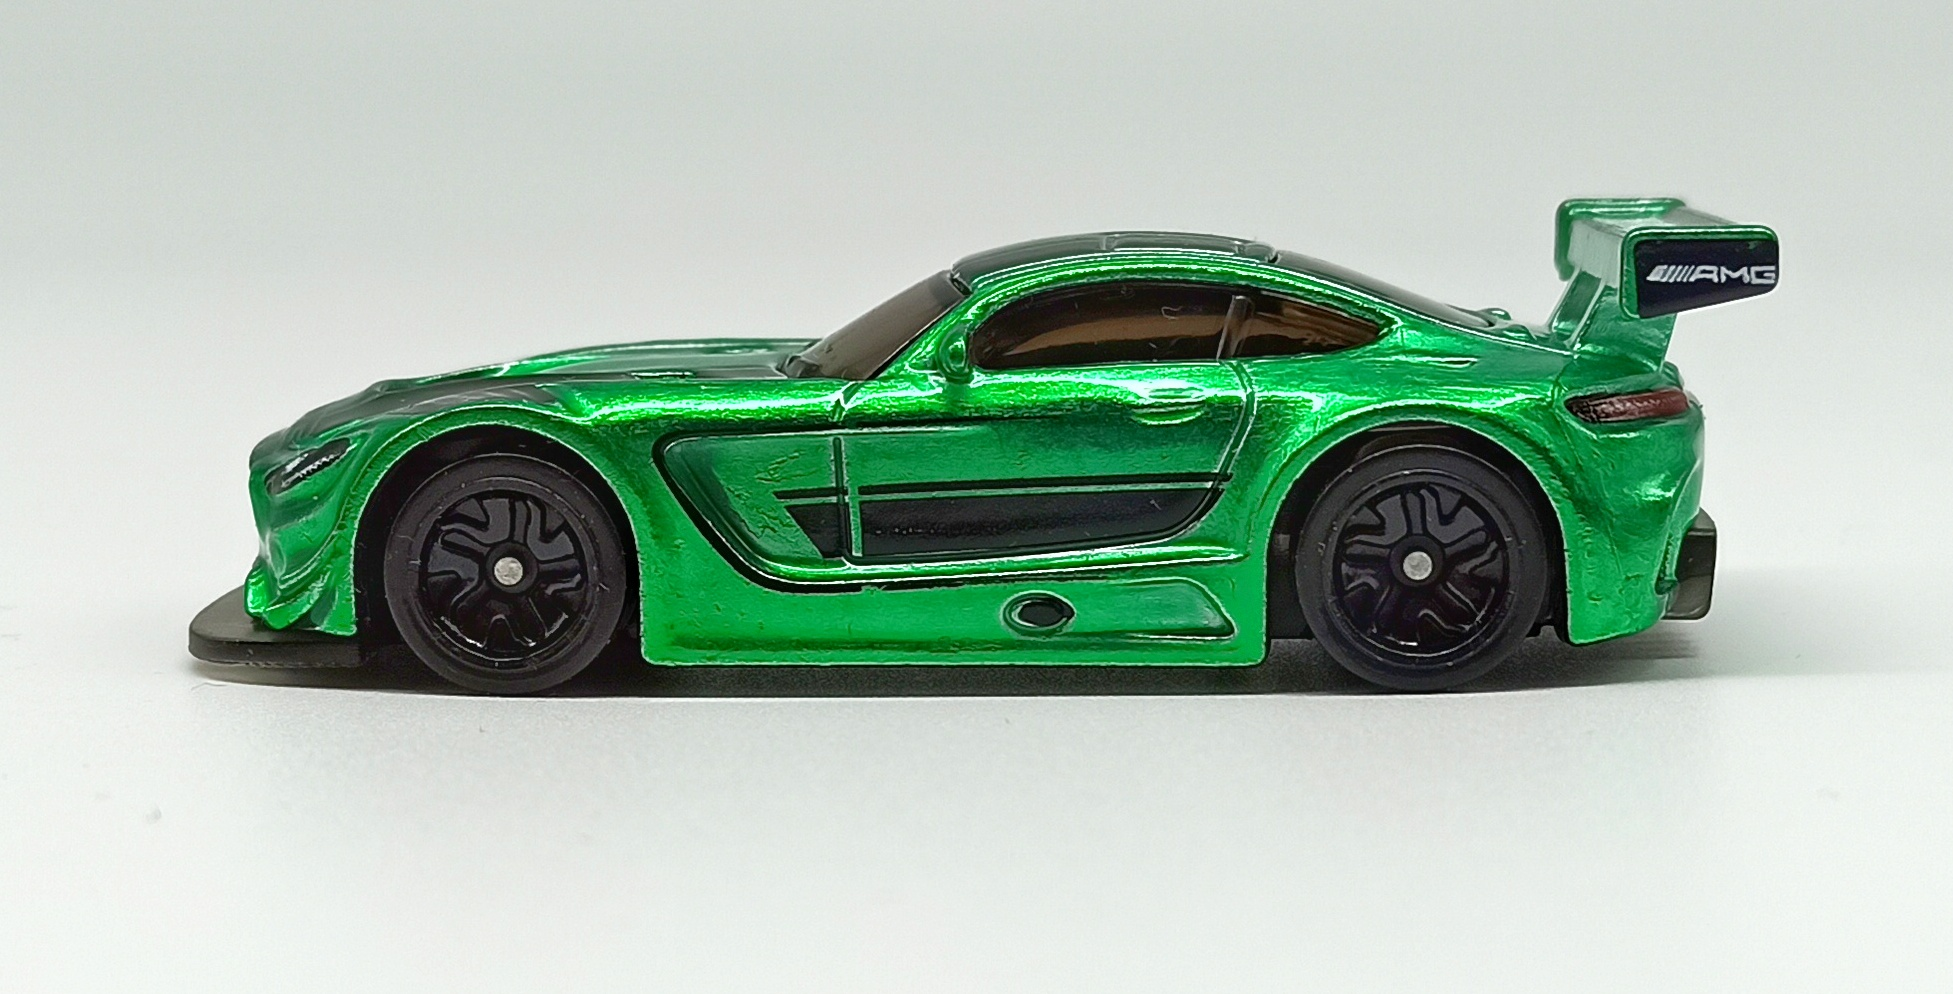 Hot Wheels id '16 Mercedes-AMG GT3 (GML21) 2021 Factory Fresh (03/04) spectraflame green side